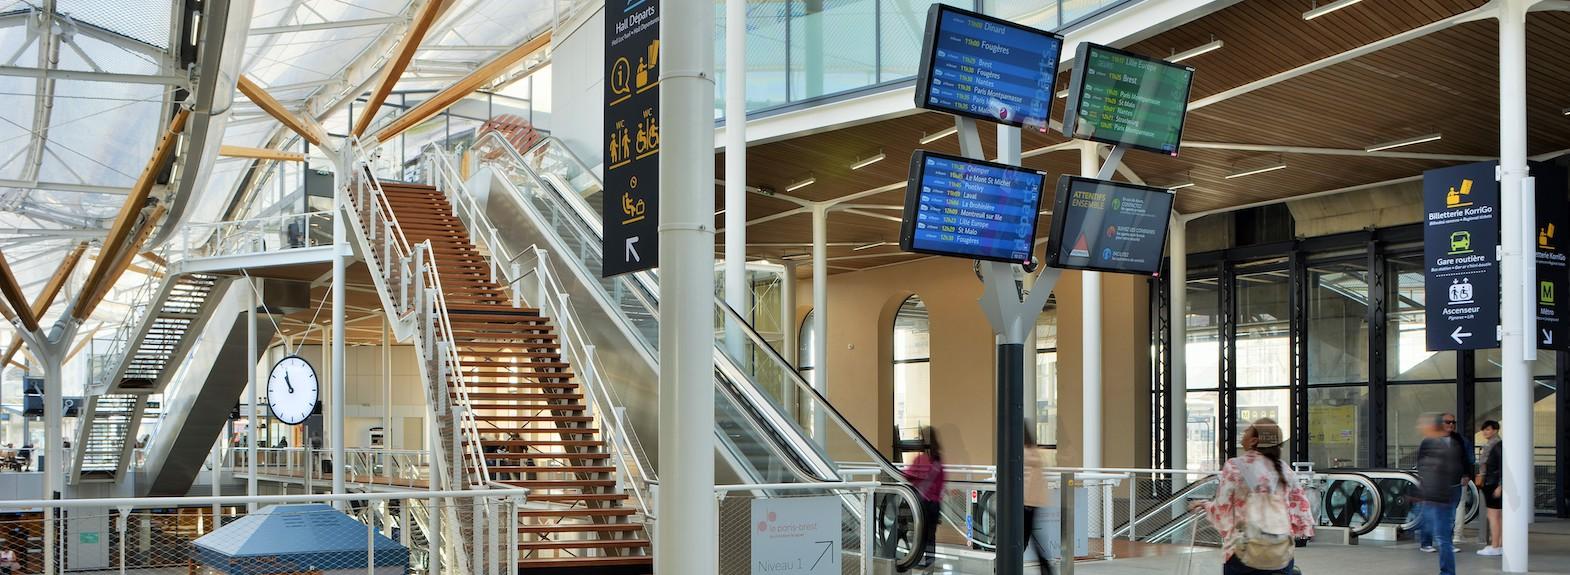 Gare_de_Rennes-Franck_Hamon-17500.jpg